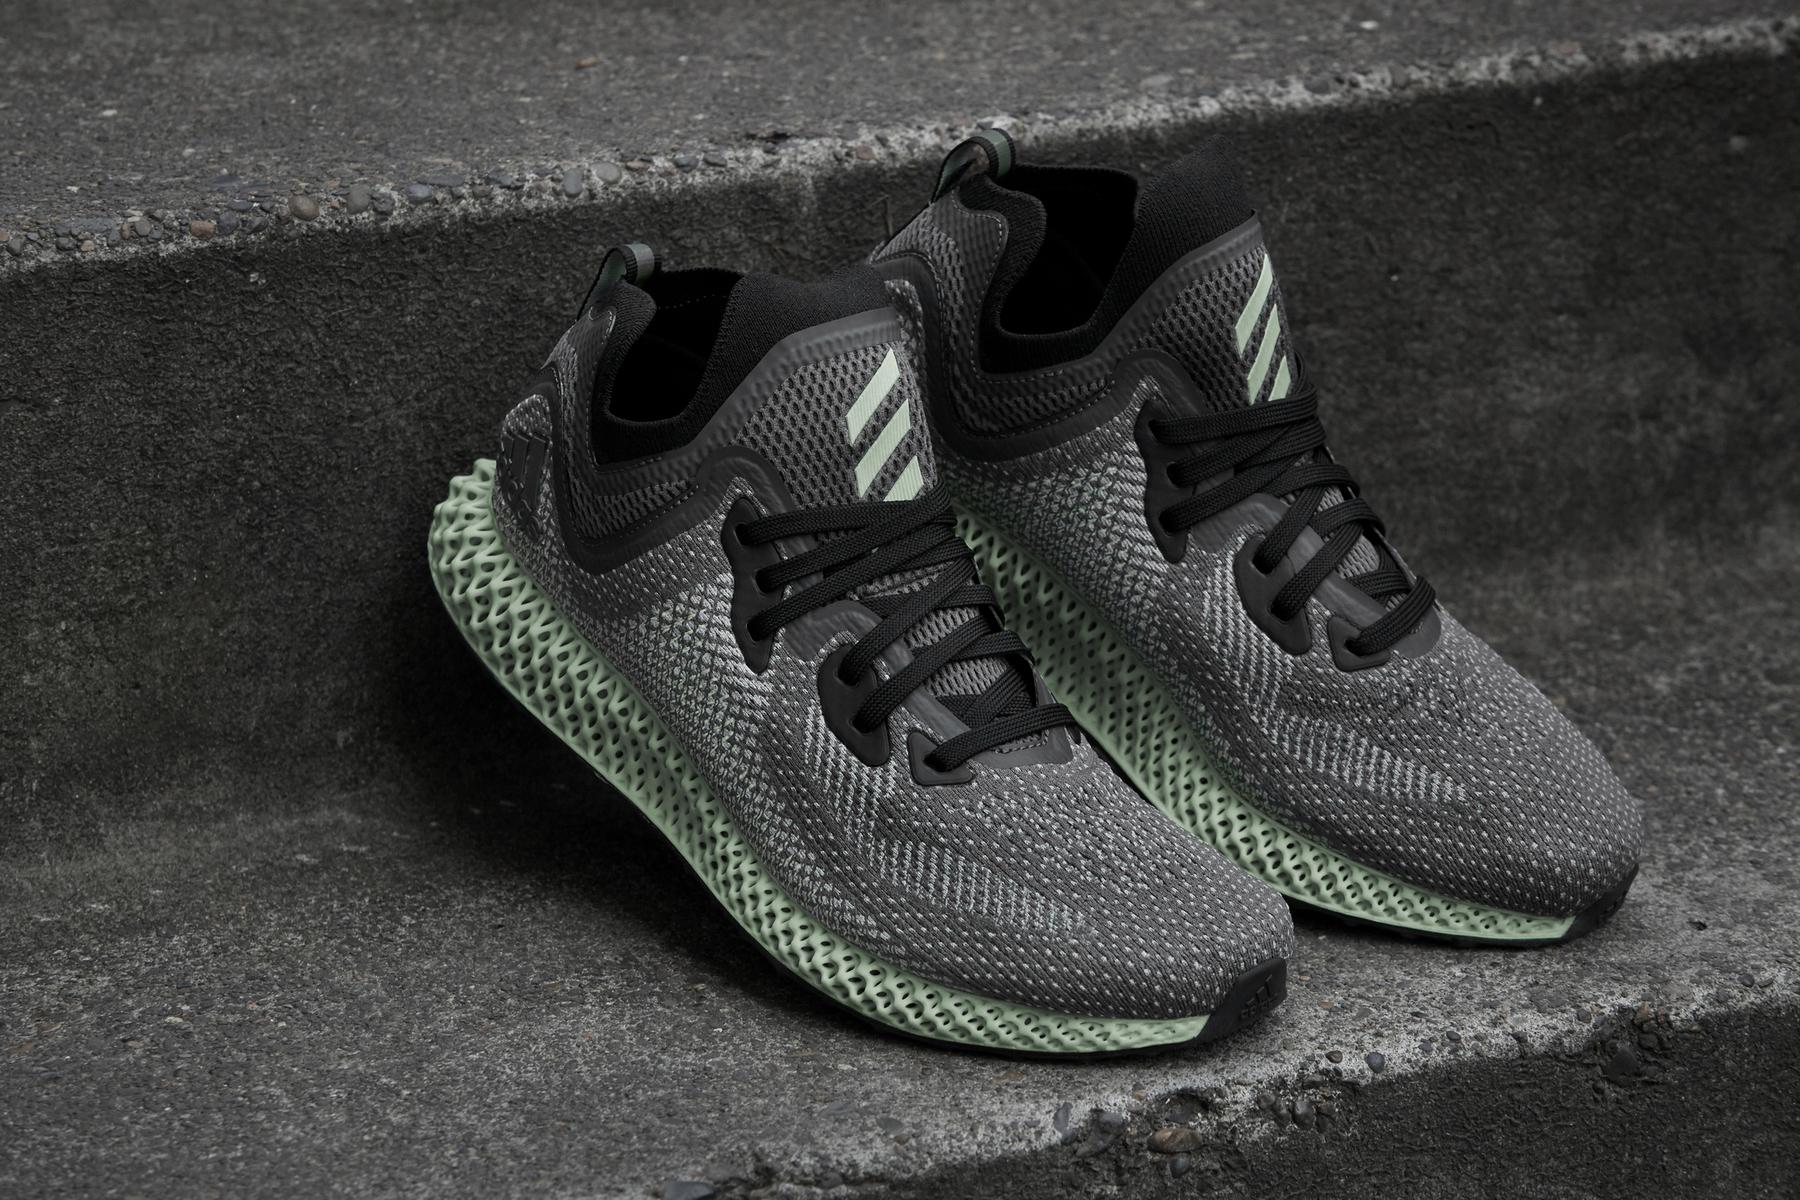 adidas-alphaedge-4d-LTD-2